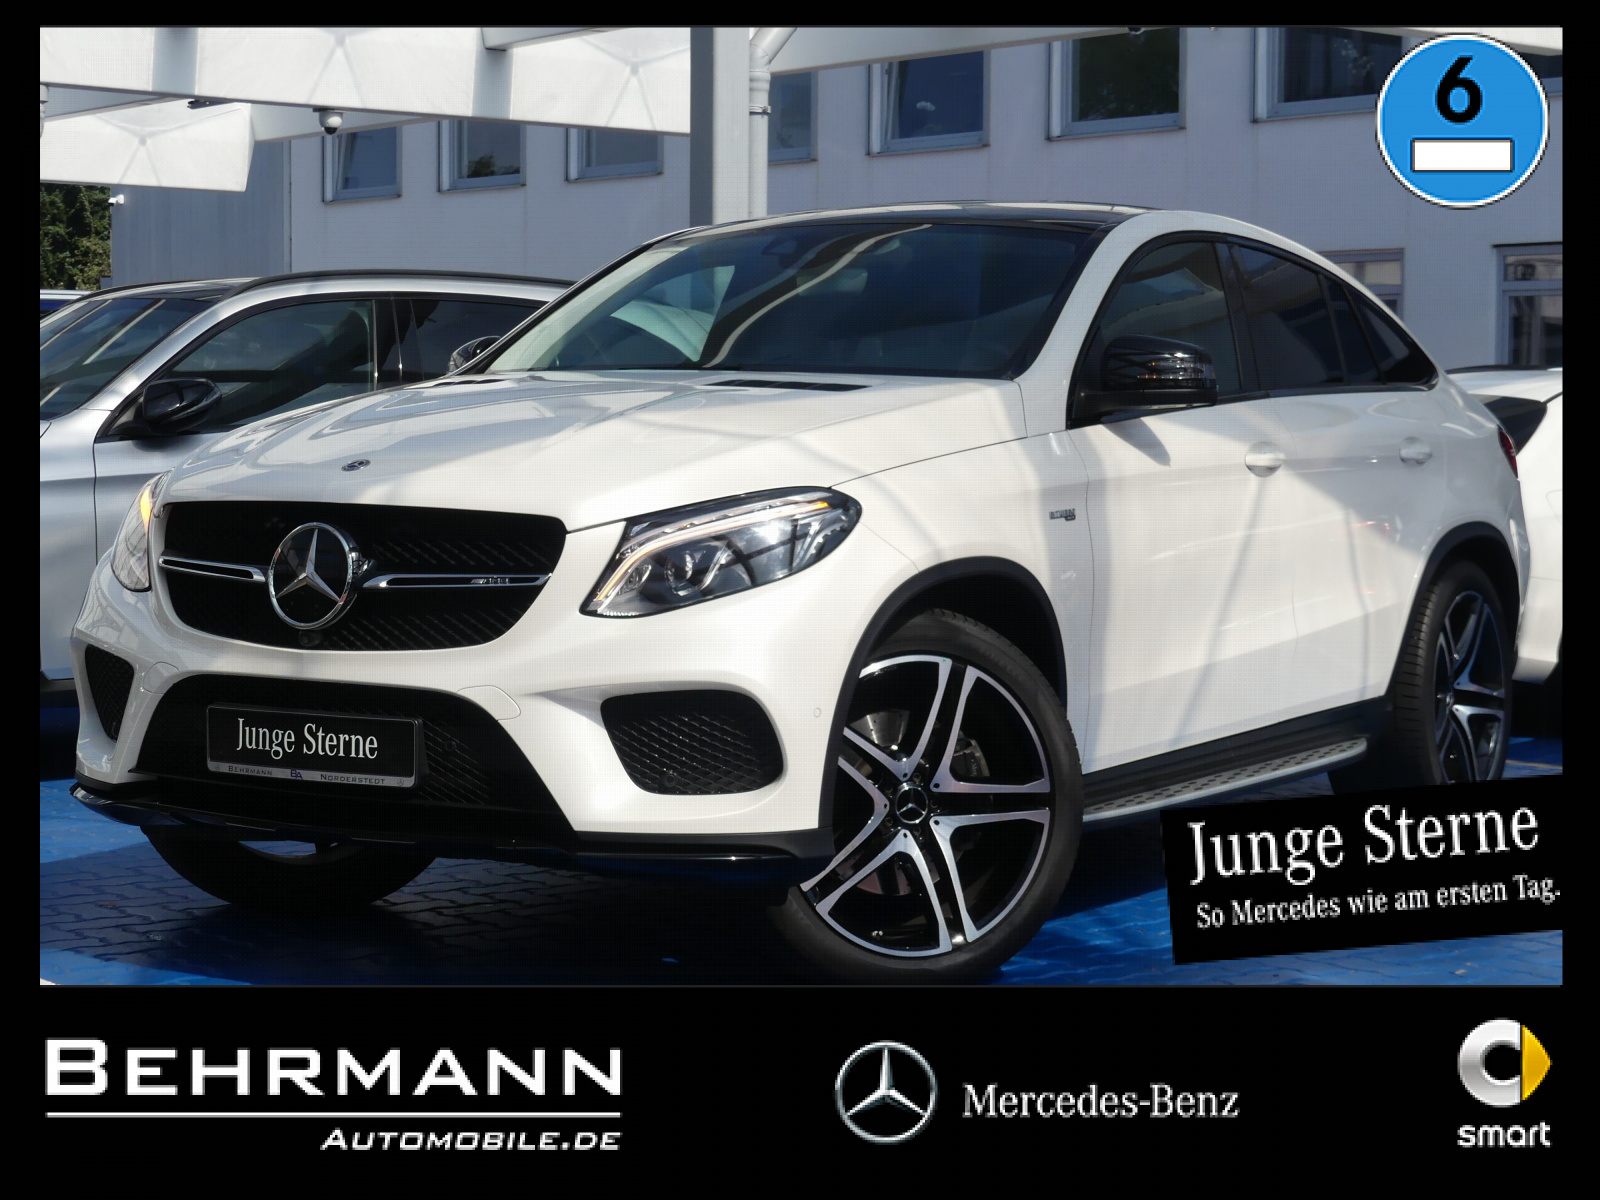 Mercedes-Benz GLE 43 AMG Coupe +360°Kamera+Distronic+Panorama+, Jahr 2018, Benzin